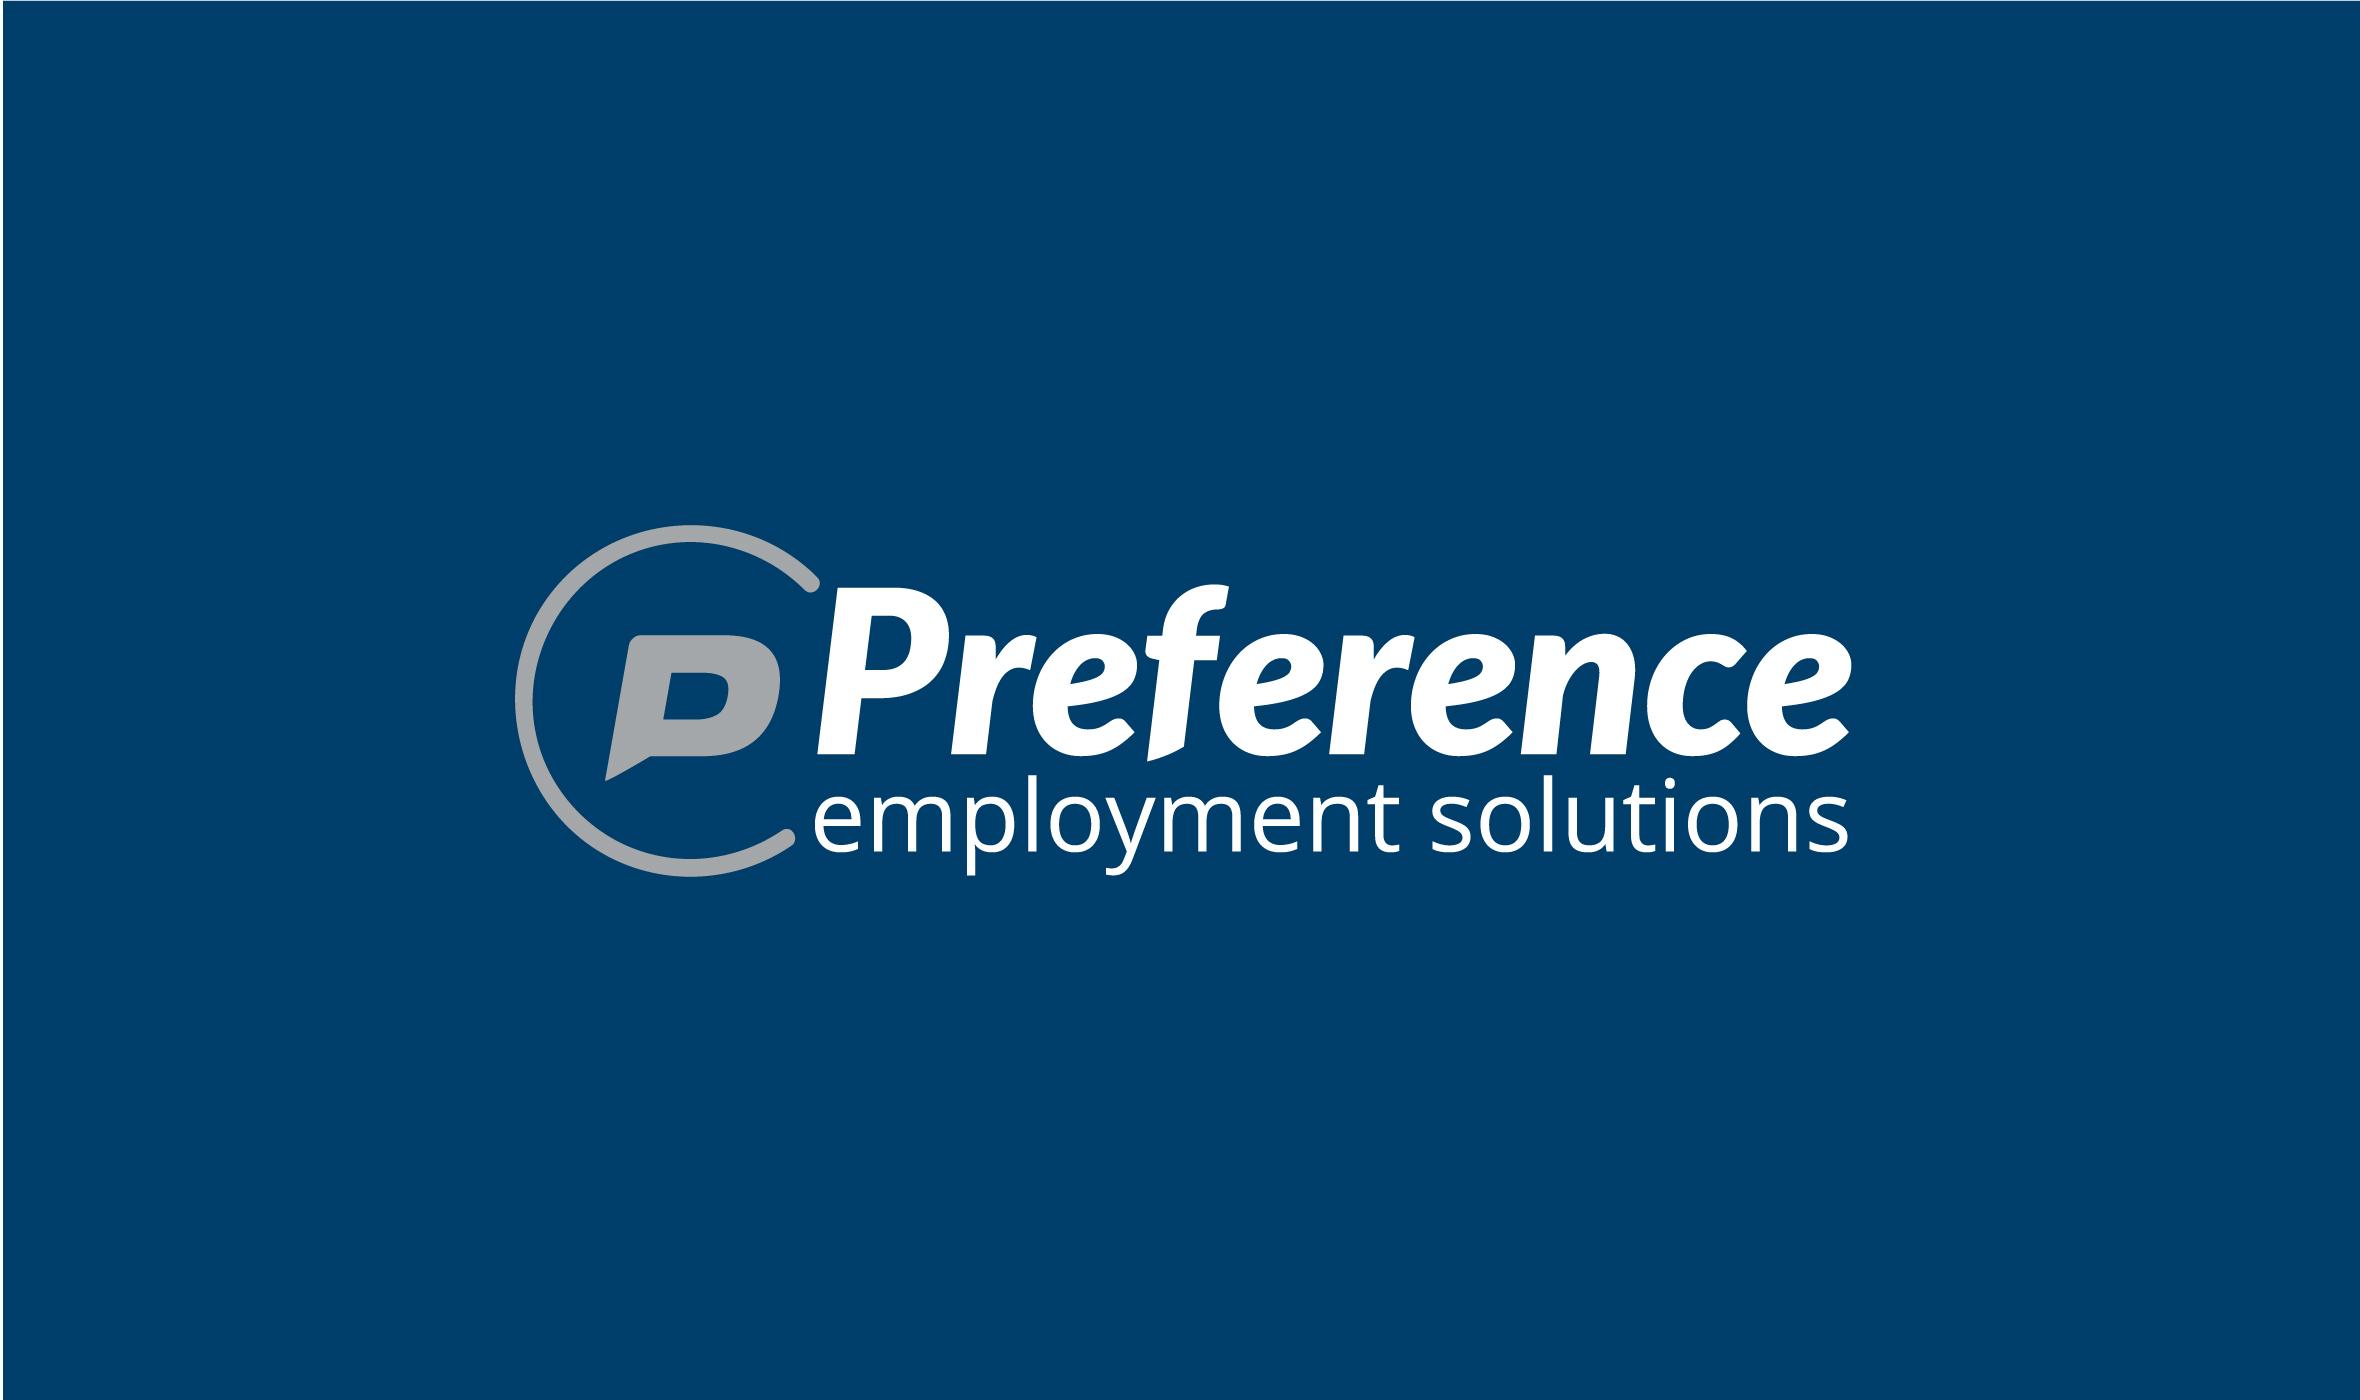 preferenceempoymentsolutions_logo